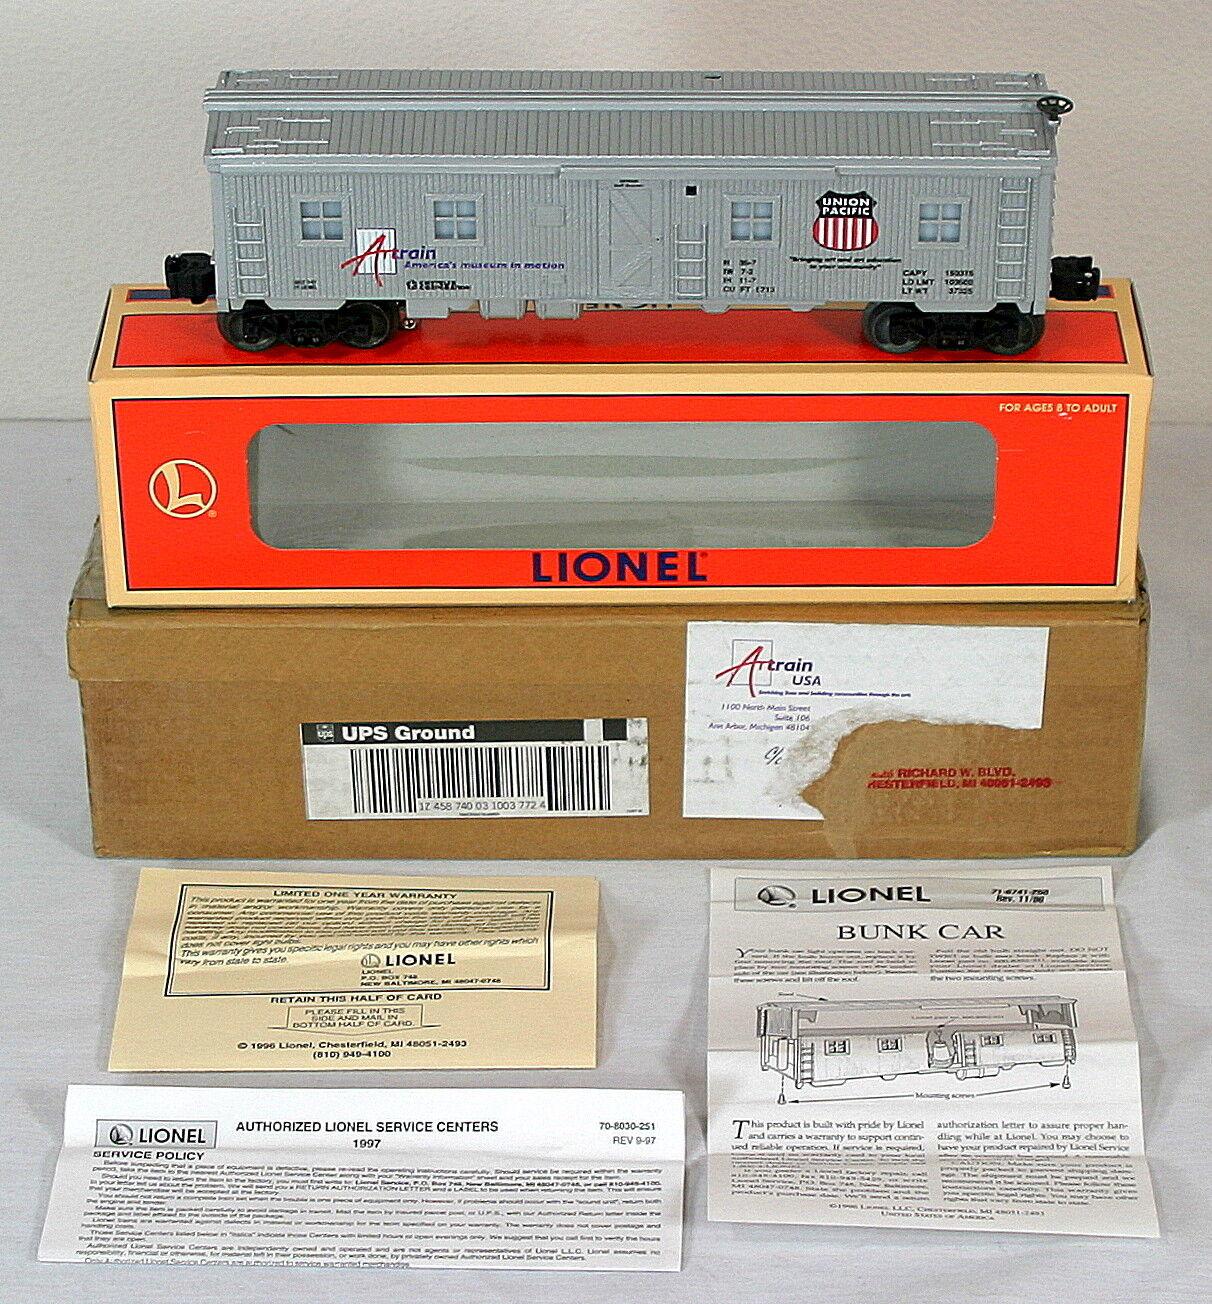 Lionel 52140 Artrain Union Pacific Bunk Car NIB w Orig. Shipping Carton